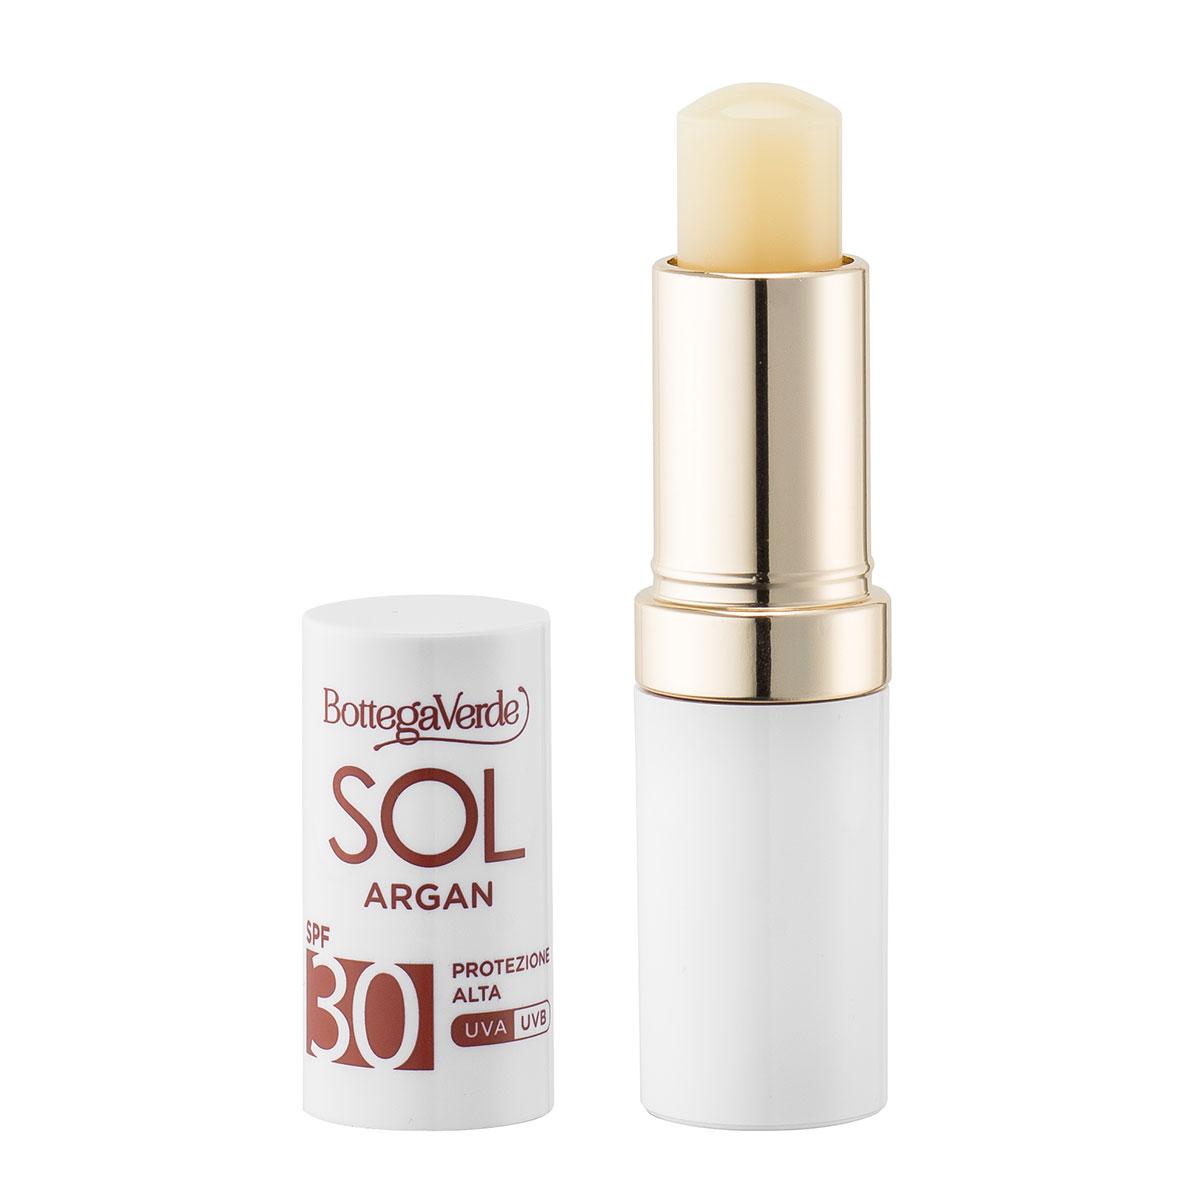 Balsam de buze, rezistent la apa, cu ulei de Argan si Vitamina E, SPF 30 imagine